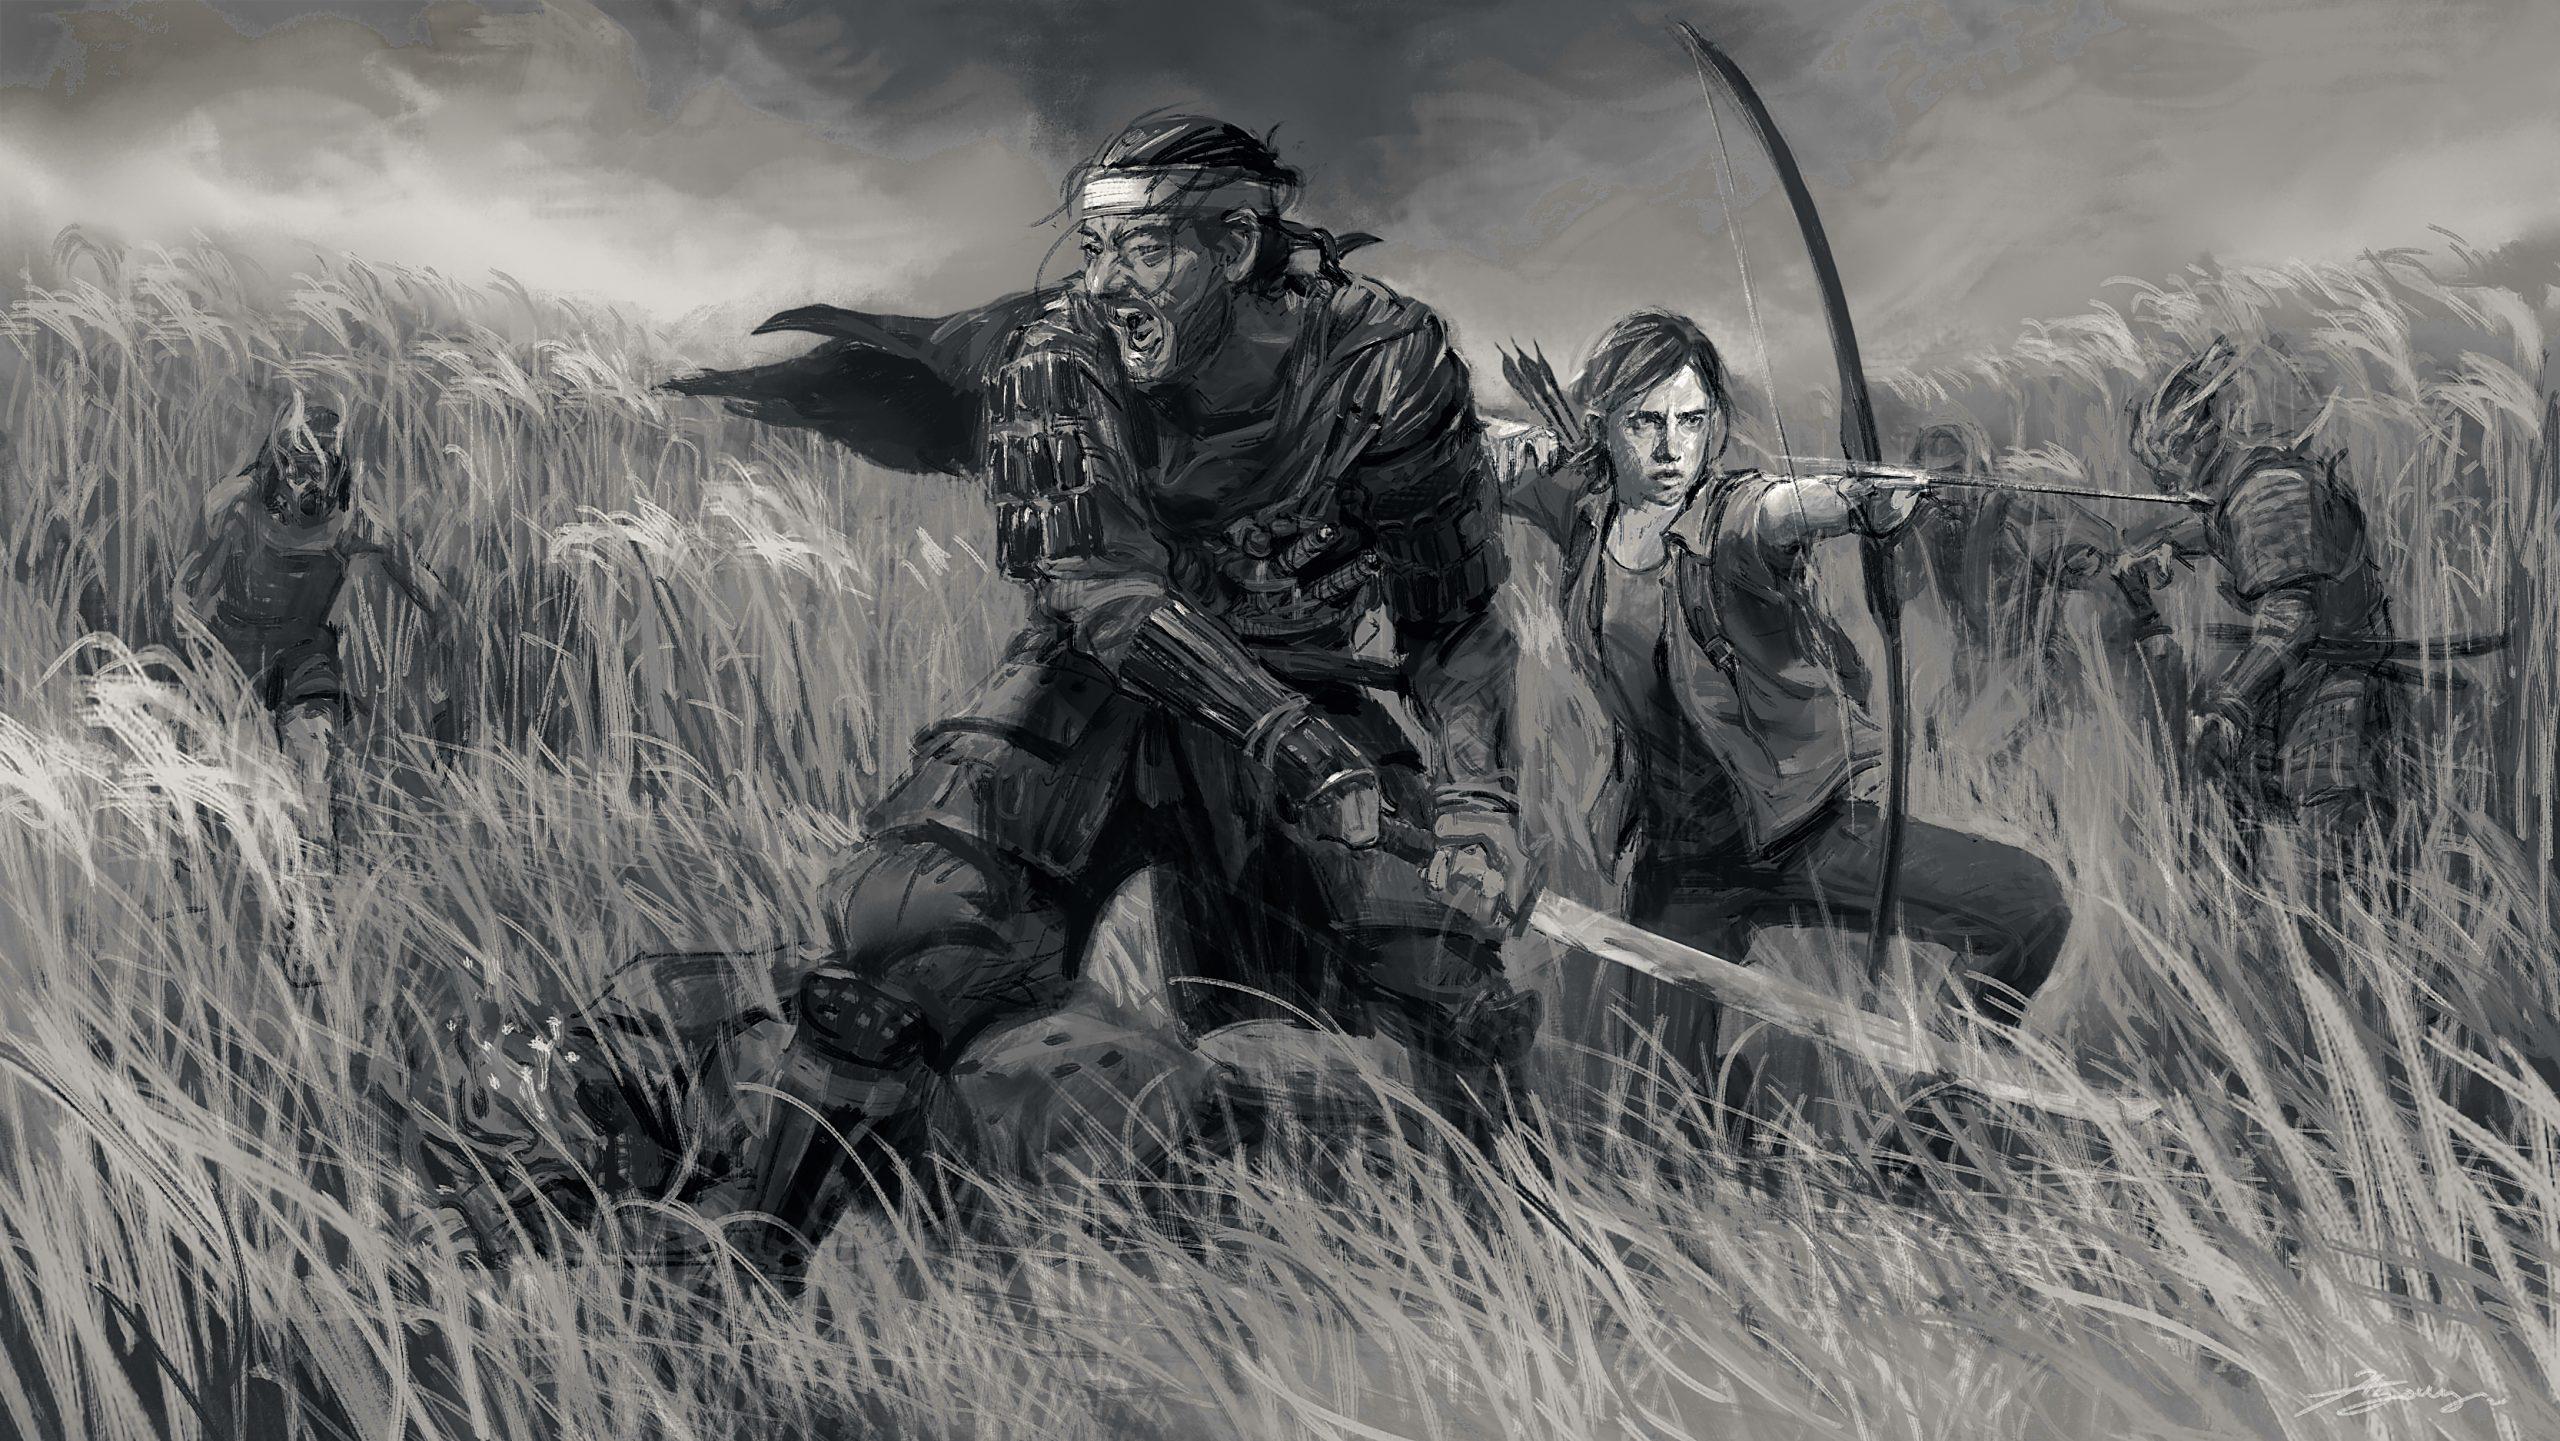 تصویر هنری Ghost of Tsushima و The Last of Us Part II